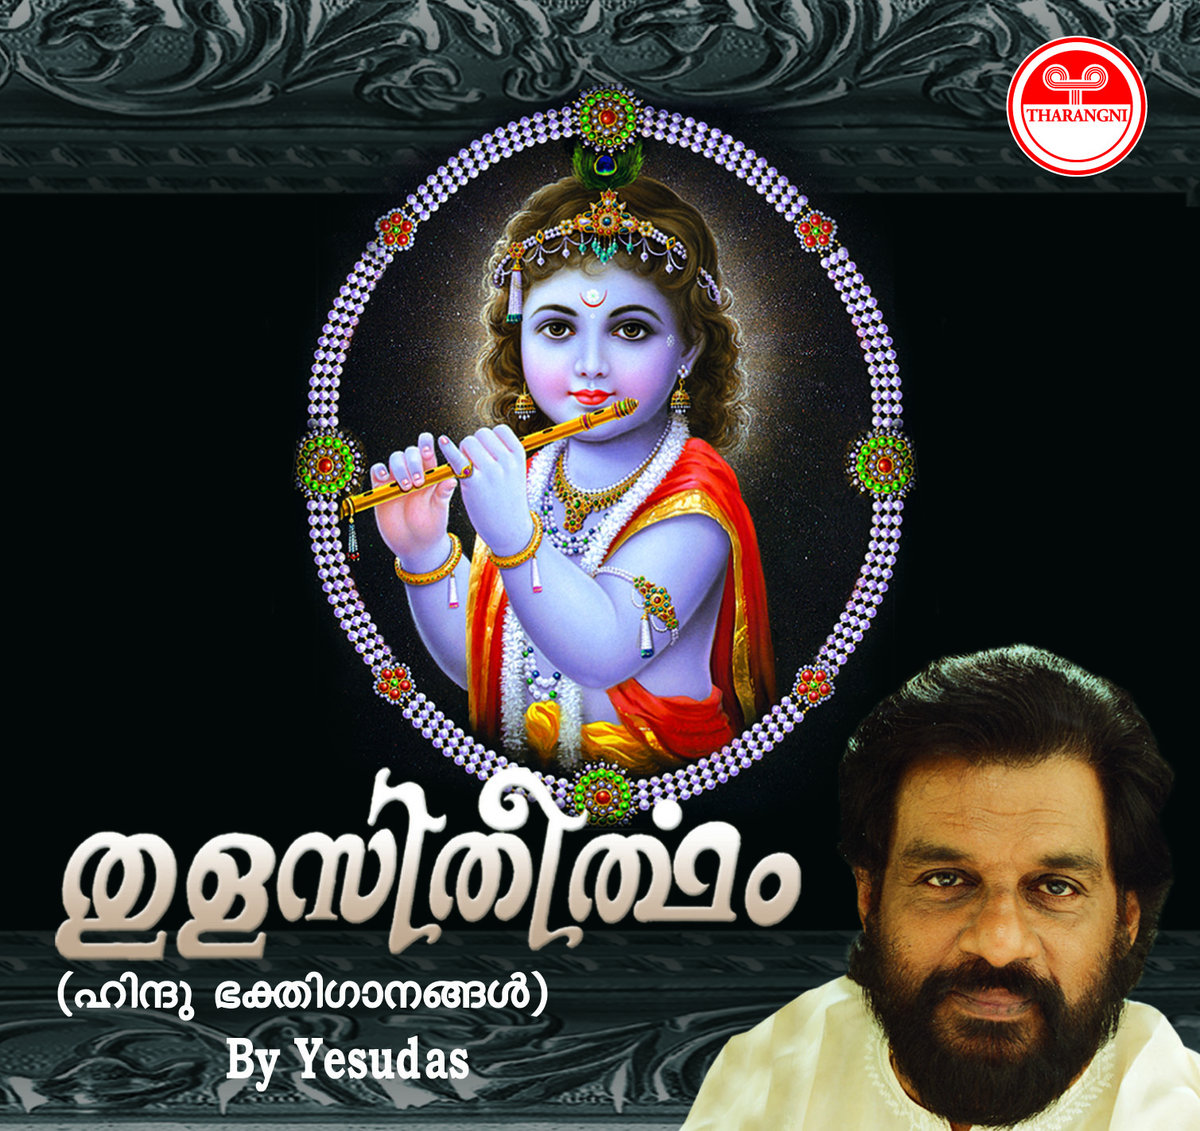 yesudas hindu devotional songs mp3 free download